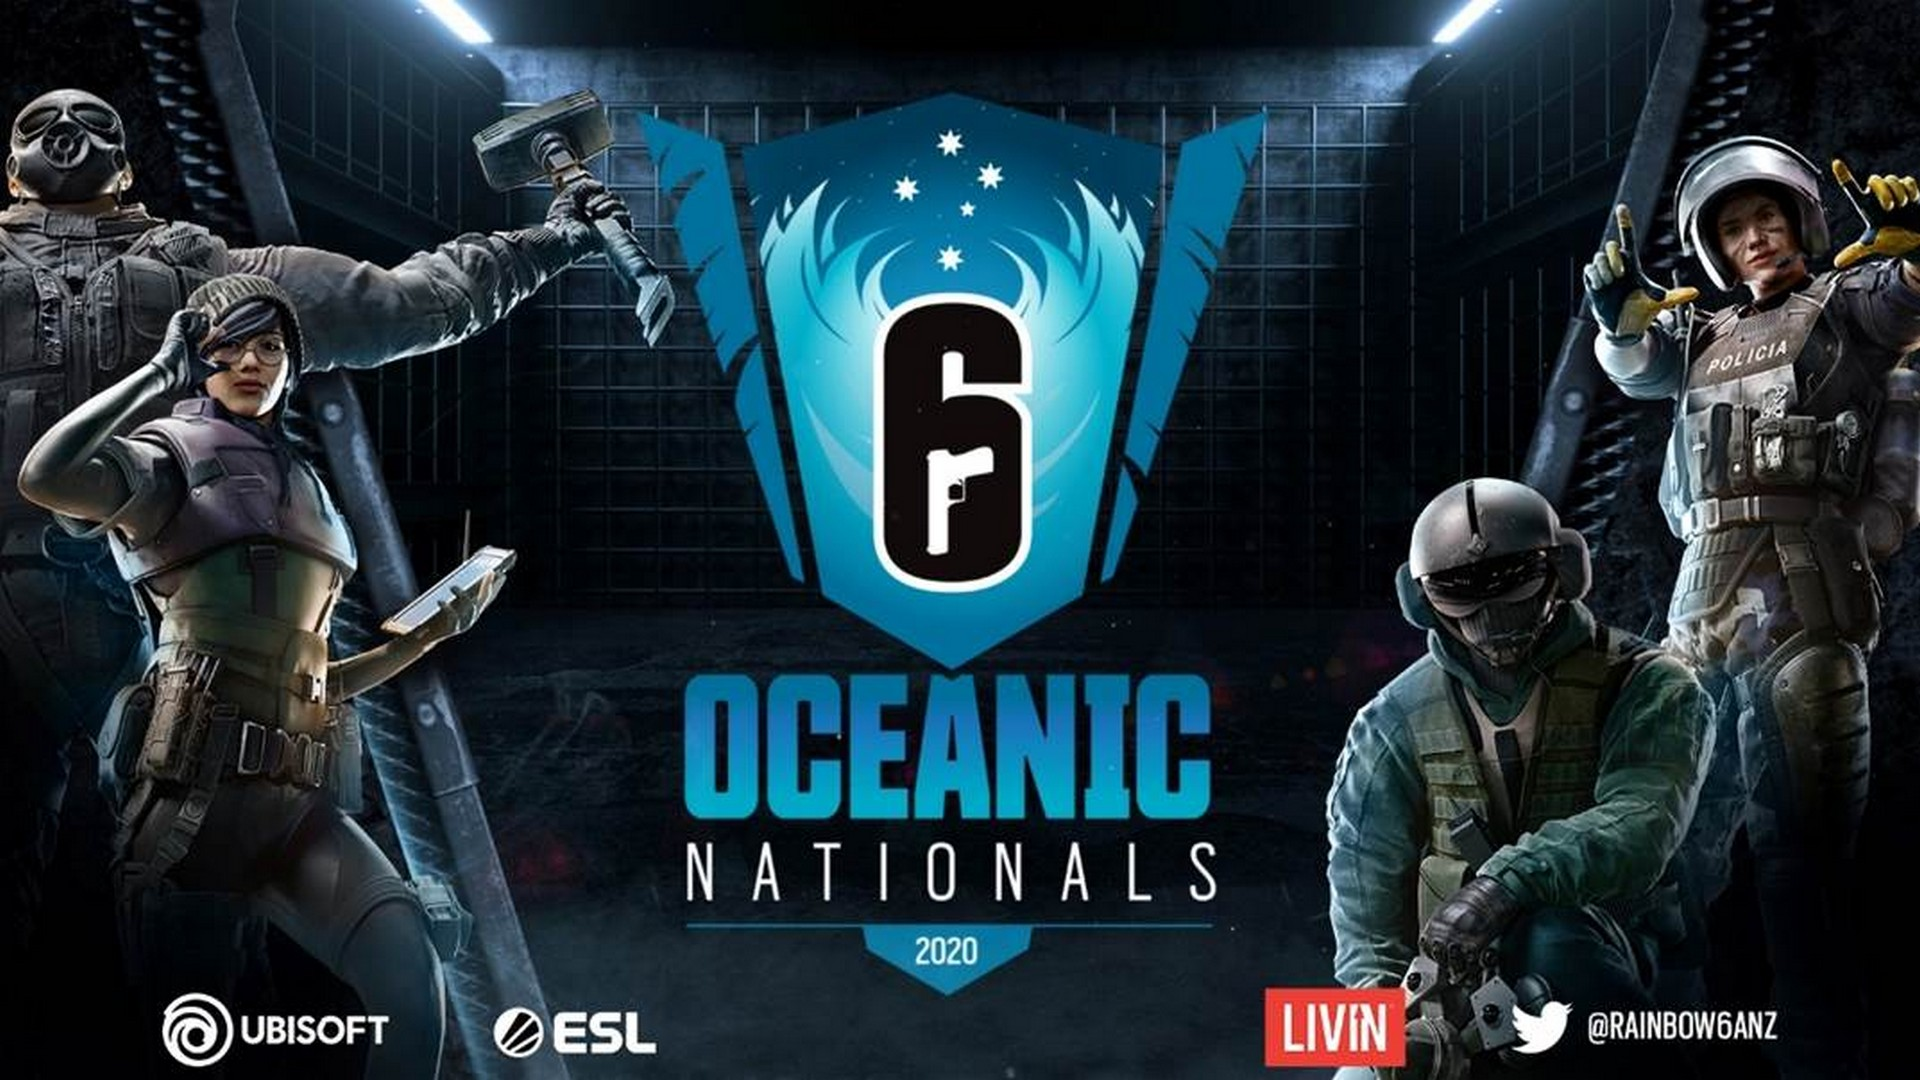 Rainbow Six Siege Oceanic Nationals Kick Off September 16th